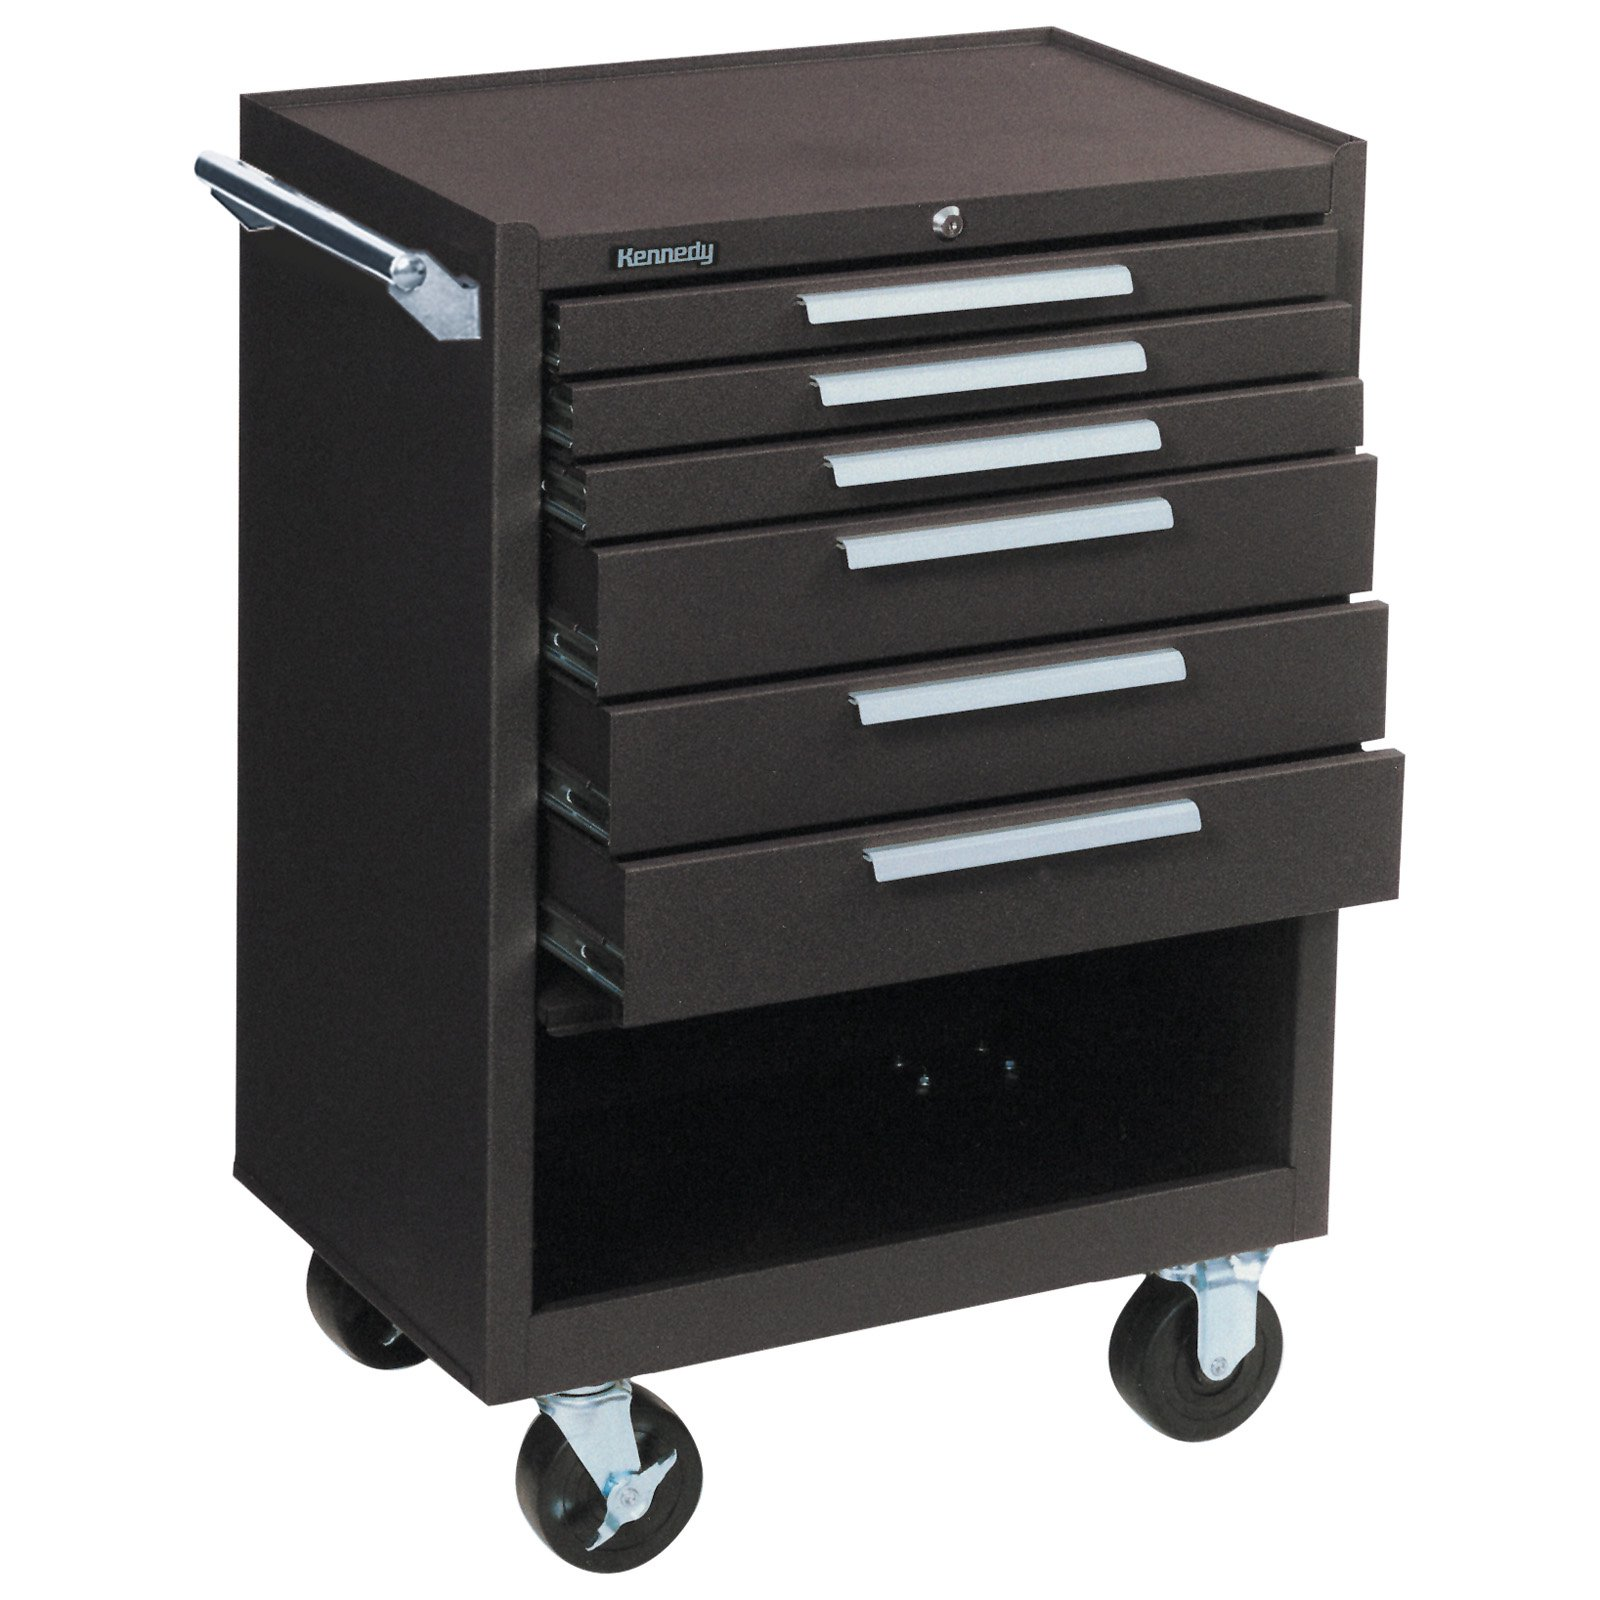 Kennedy Roller Cabinet Design For Home